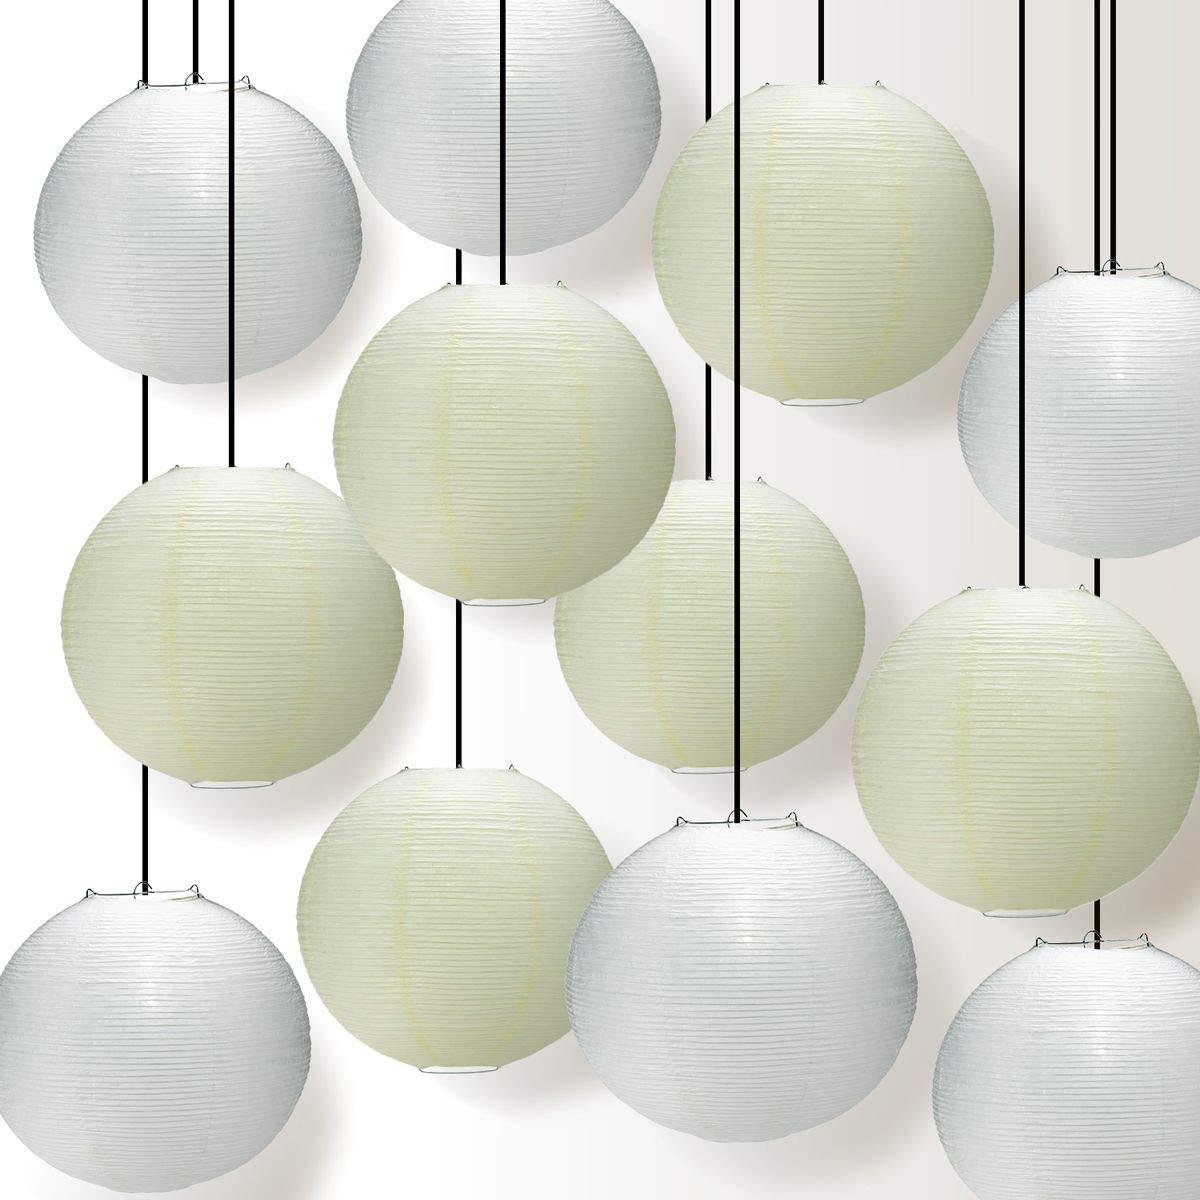 Quasimoon PaperLanternStore.com Premium 12-Piece Fine Line White and Beige Paper Lantern Party Pack Set